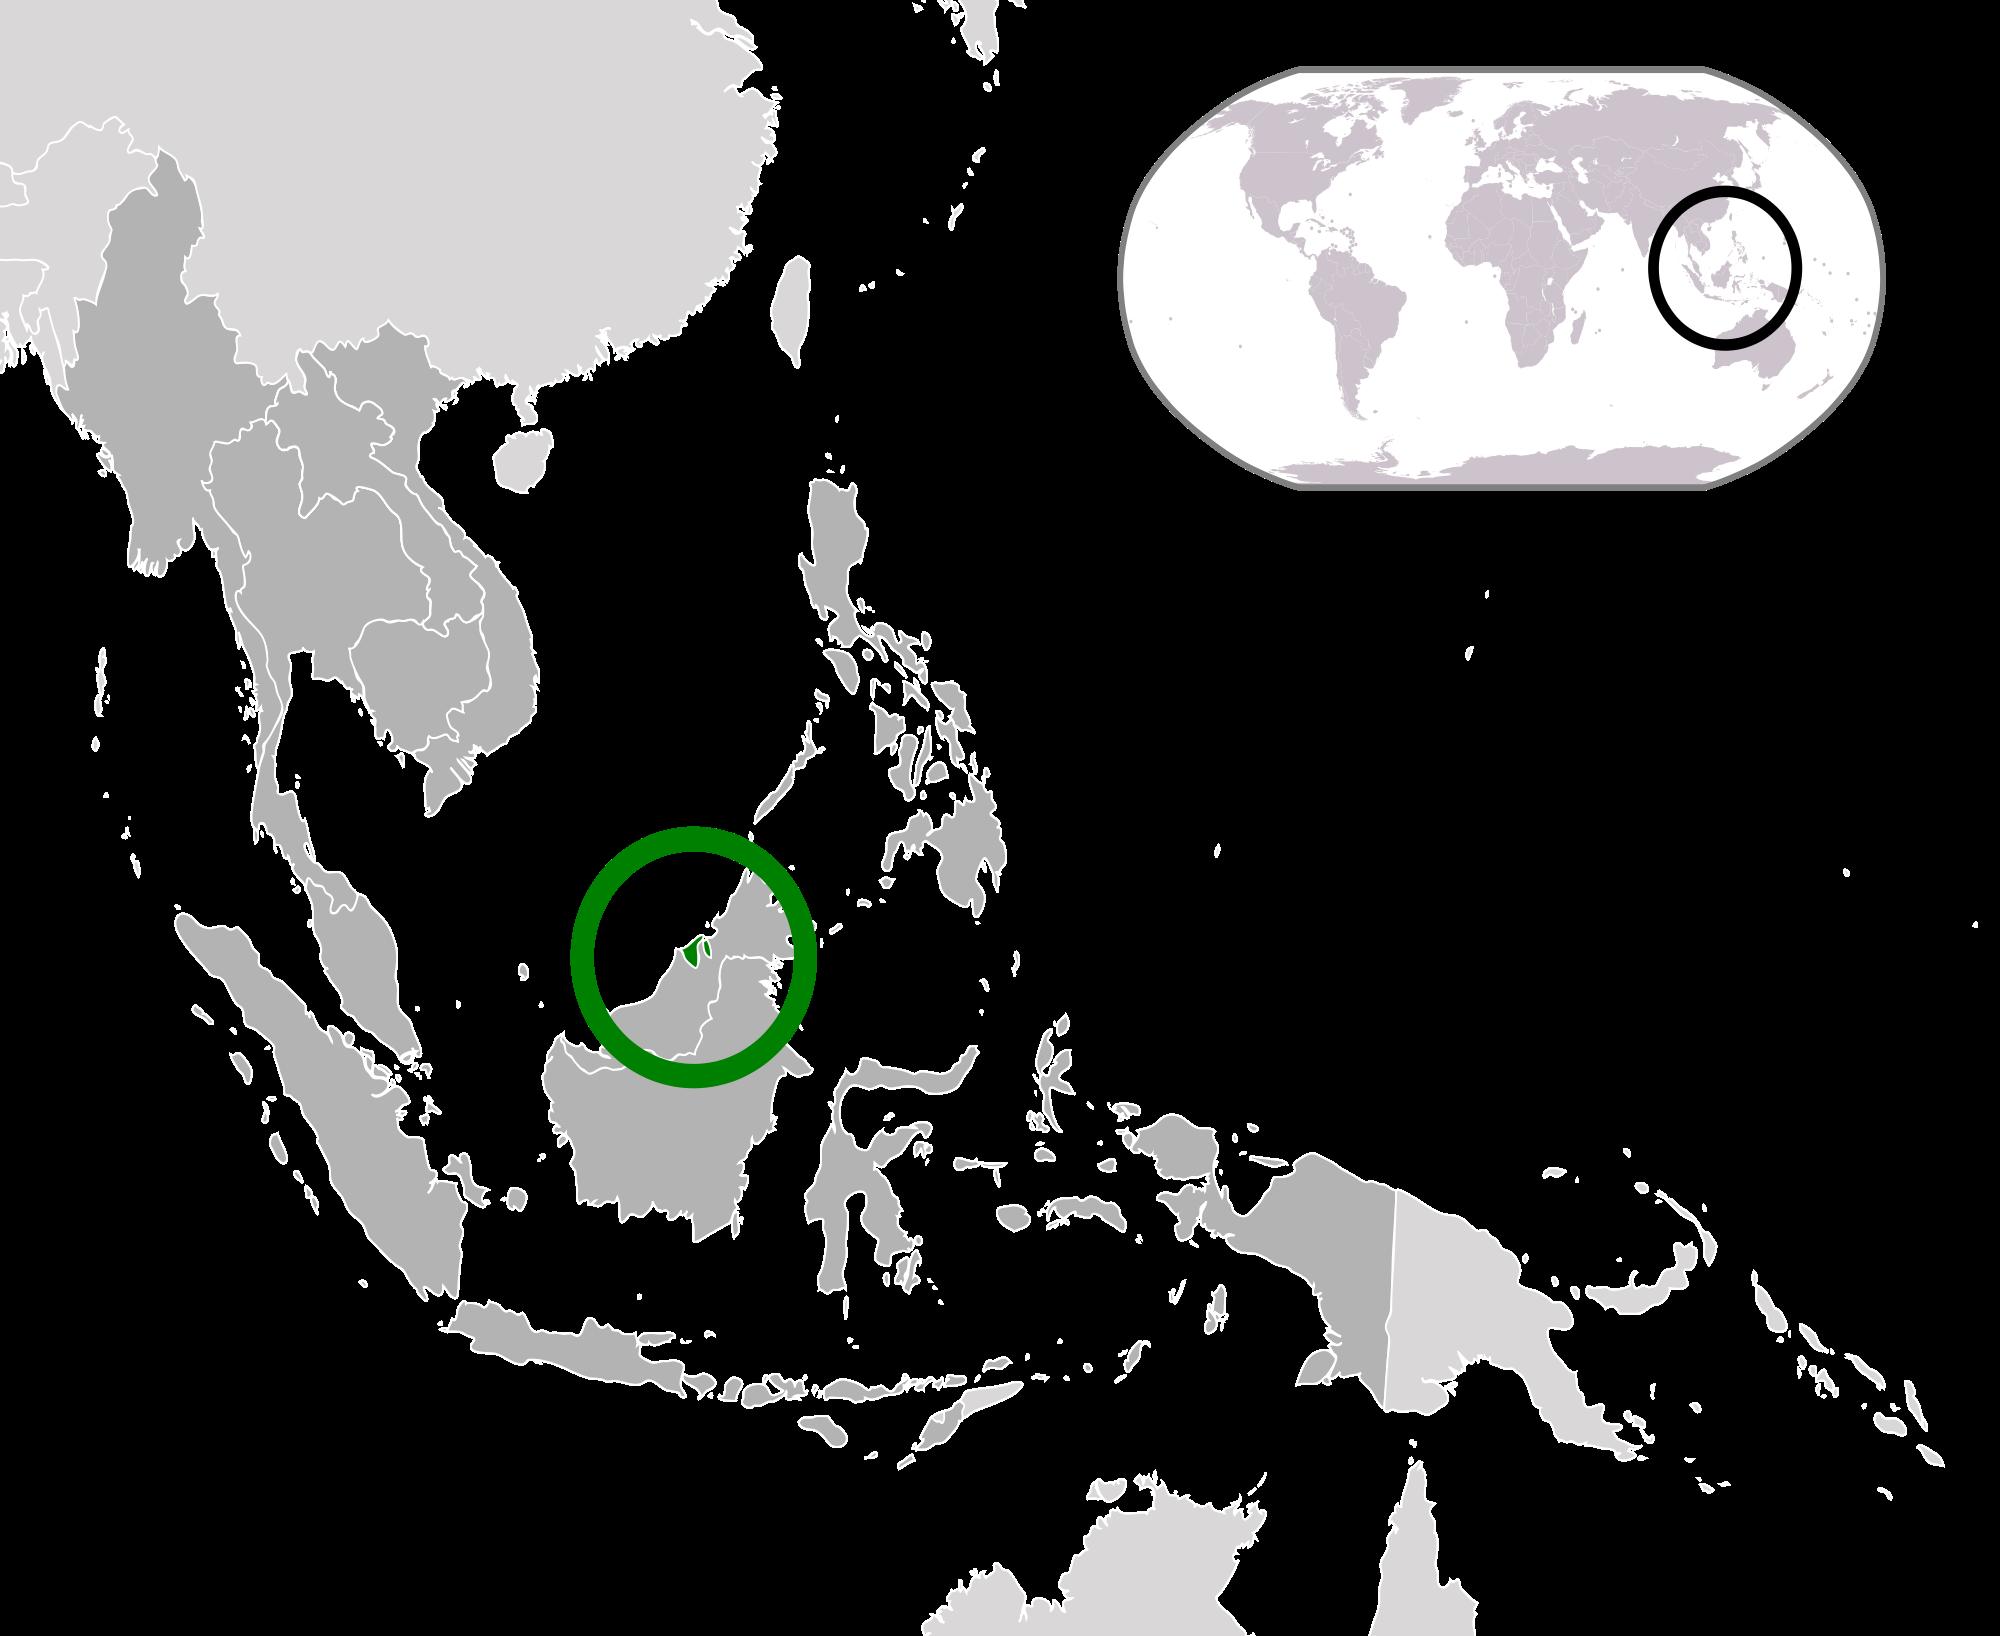 Brunei wikipedia of greenin. Location clipart absolute location